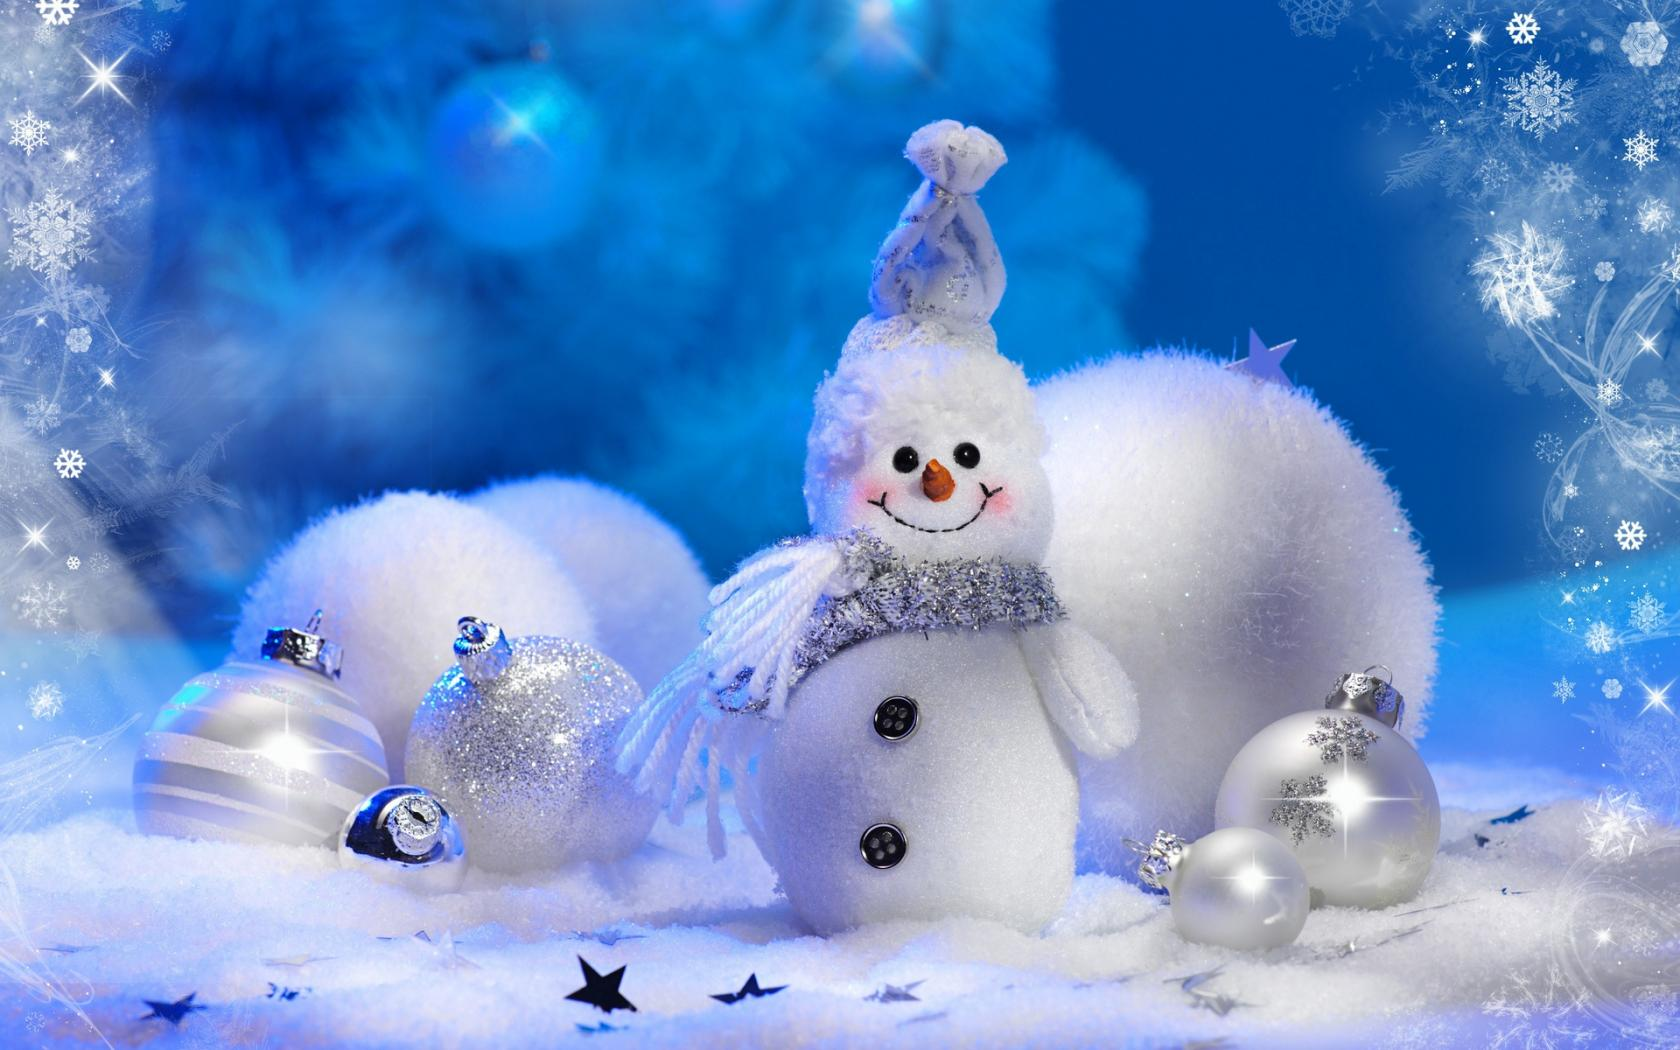 winter_snowman_xmas.jpg